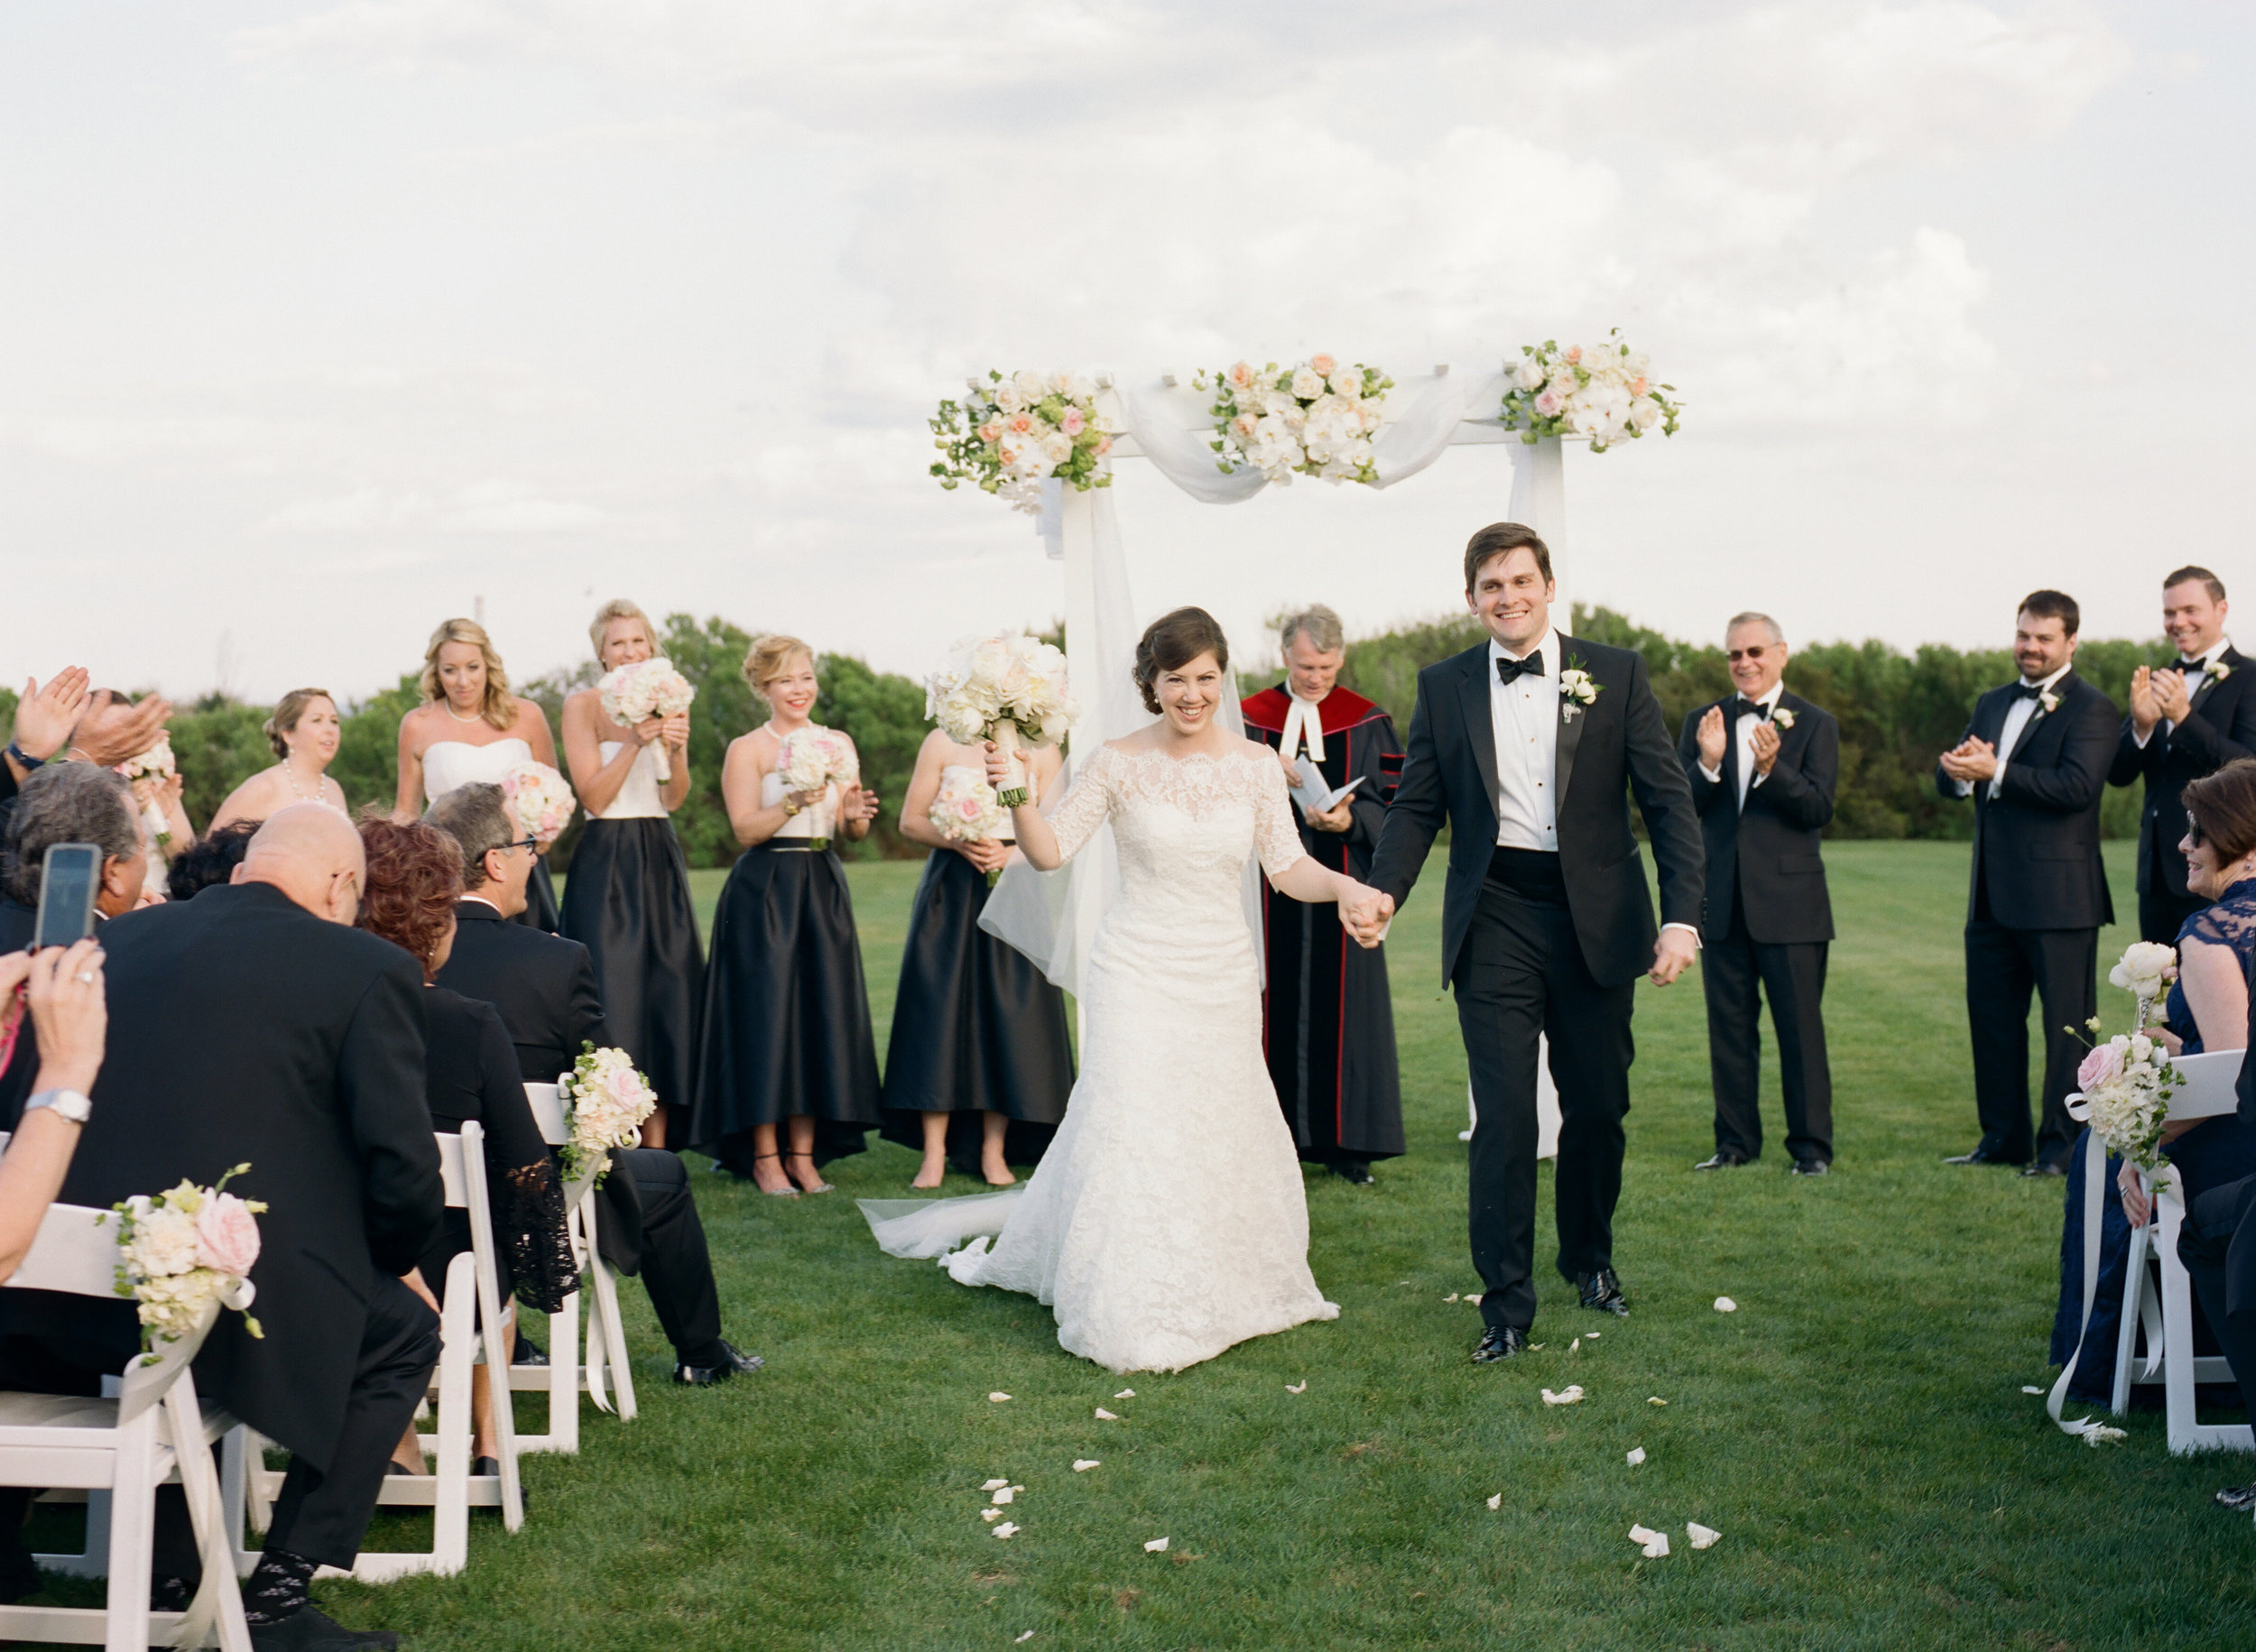 Thomas & Alanna - Dunes Golf & Beach Club Wedding